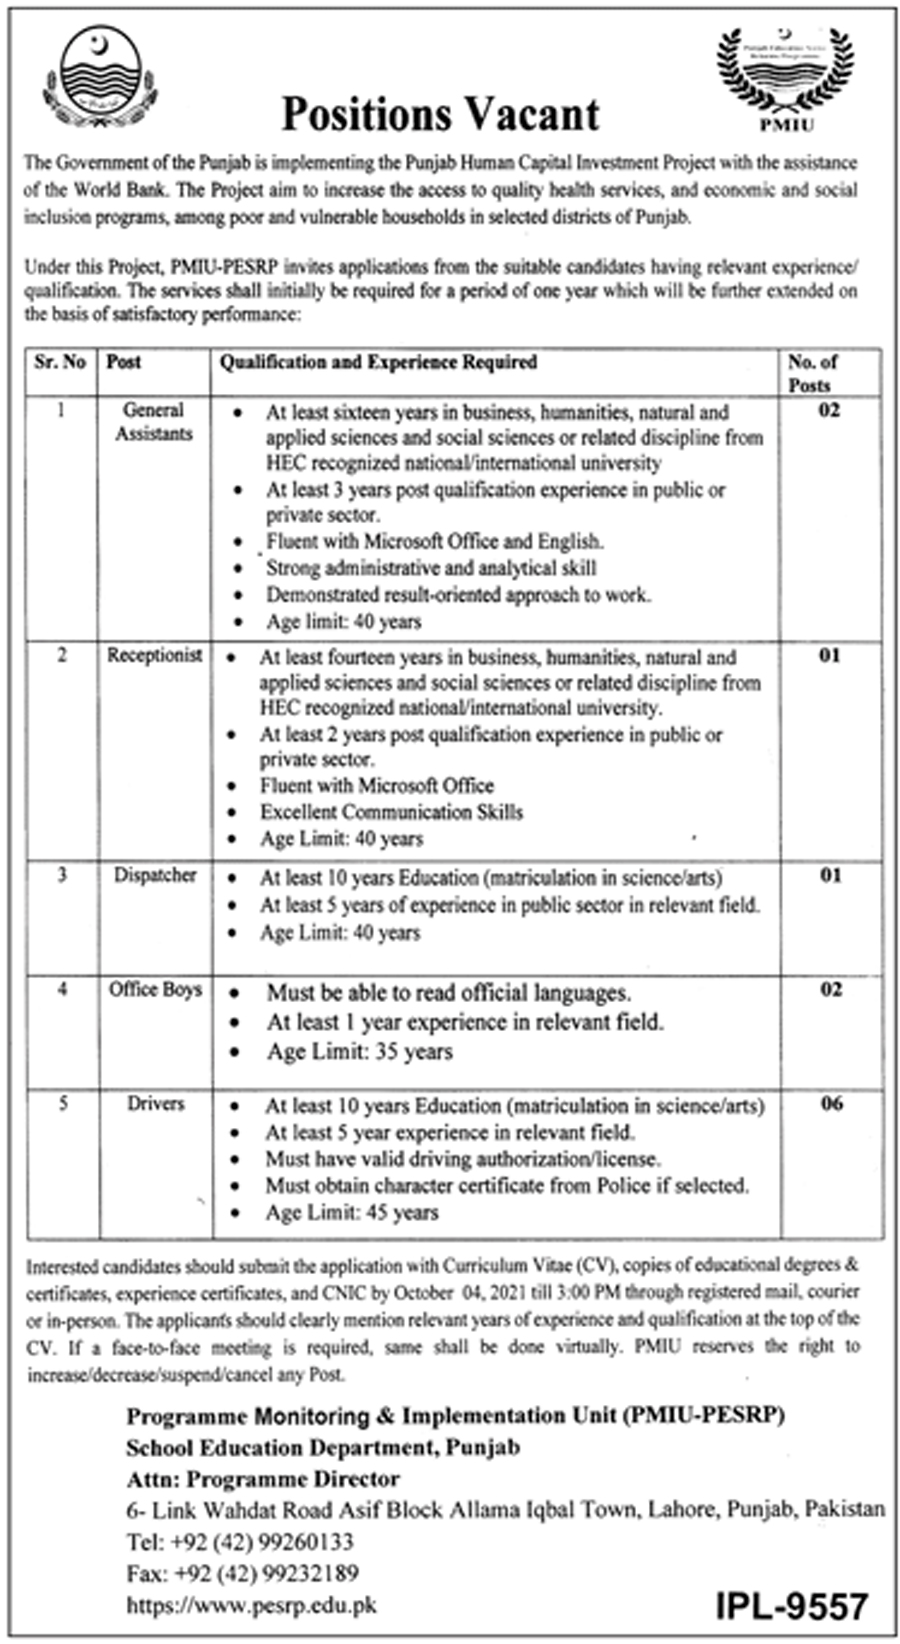 Punjab School Education Department PESRP Jobs 2021